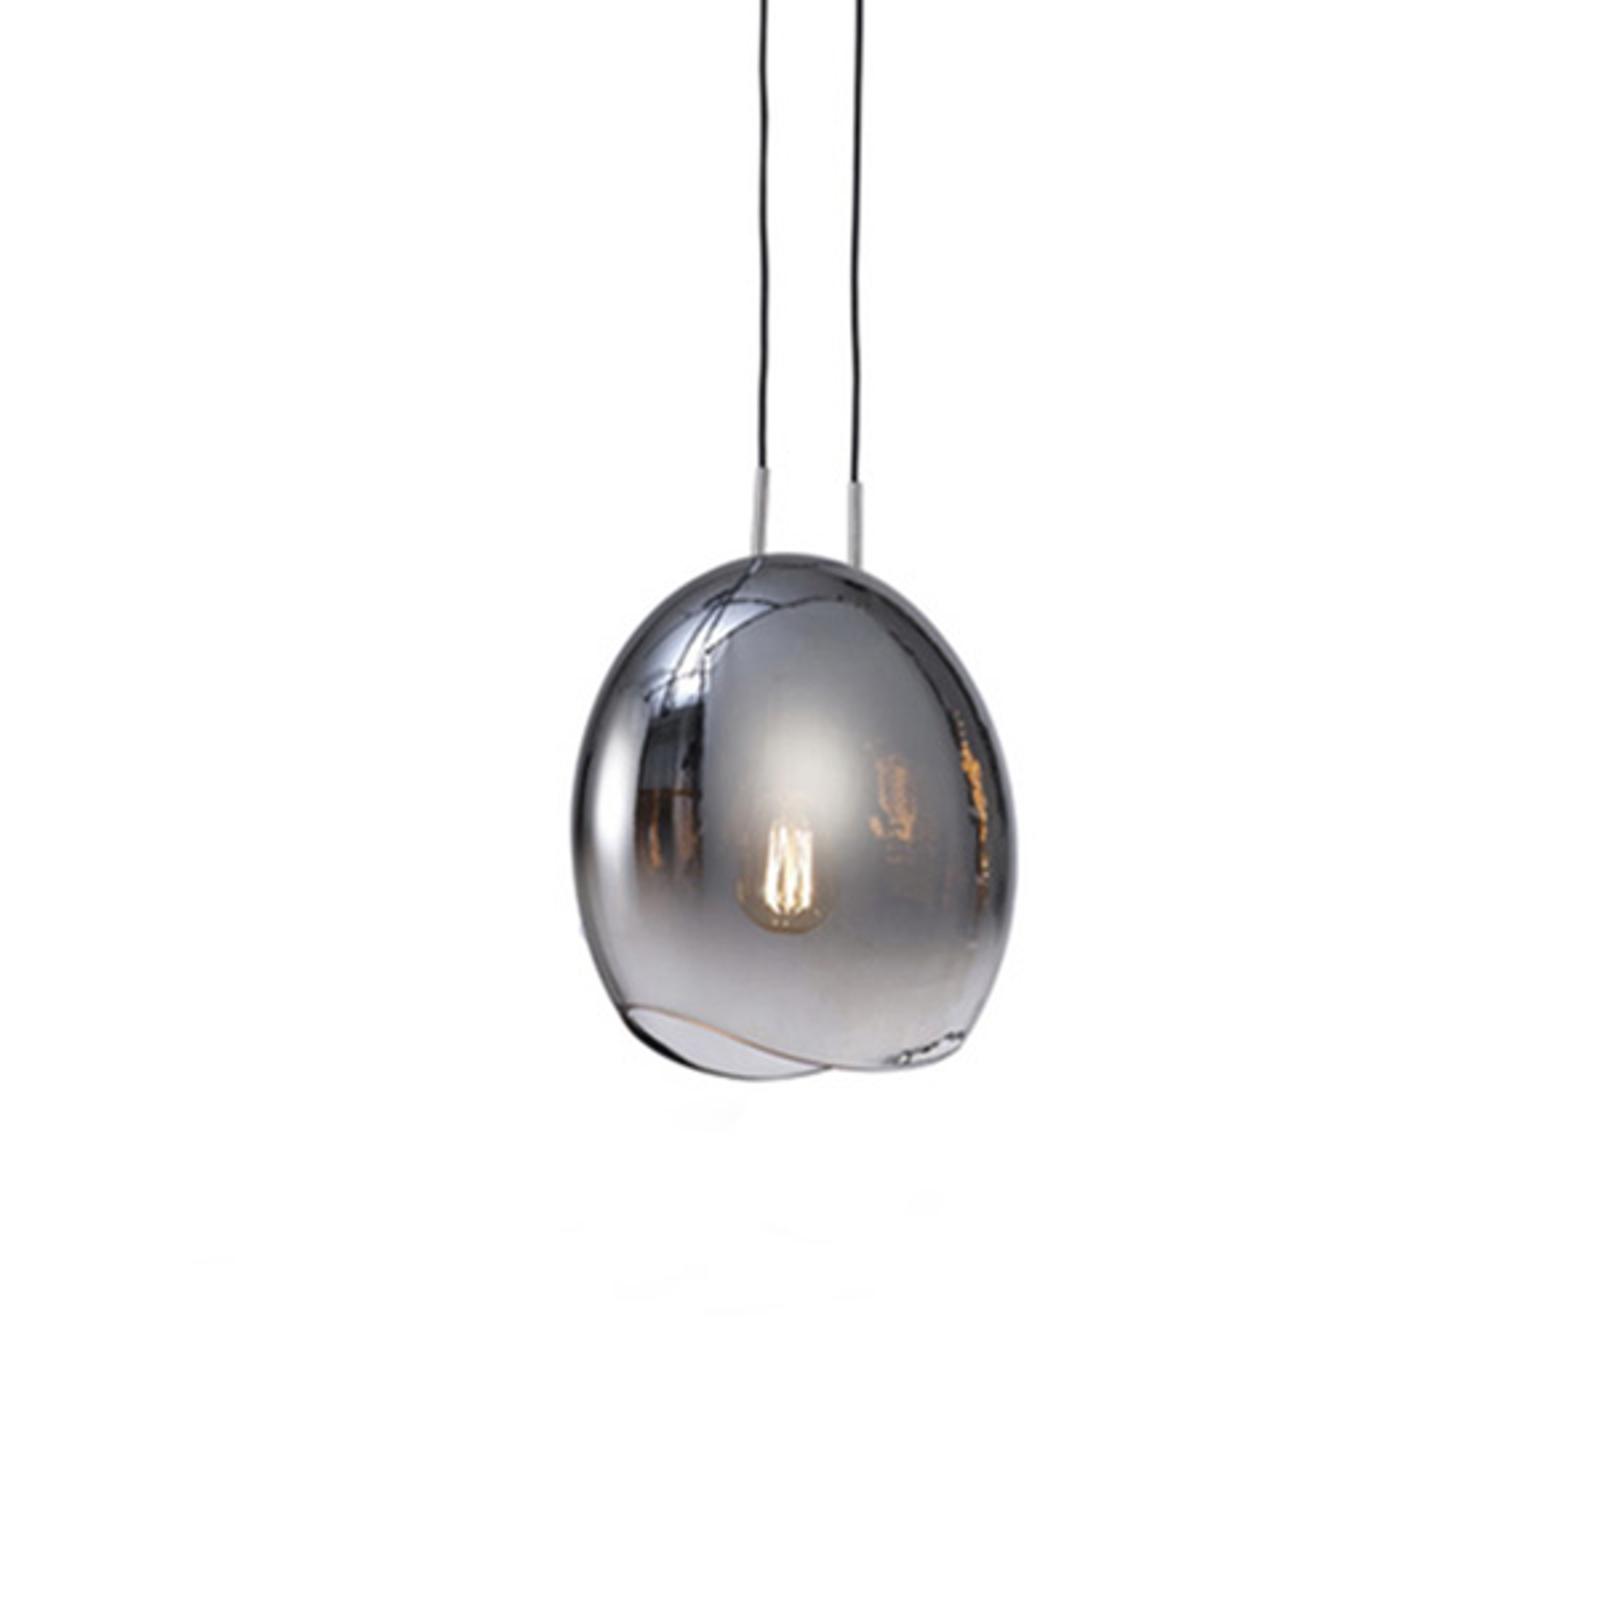 Lampa wisząca Lens 25 cm